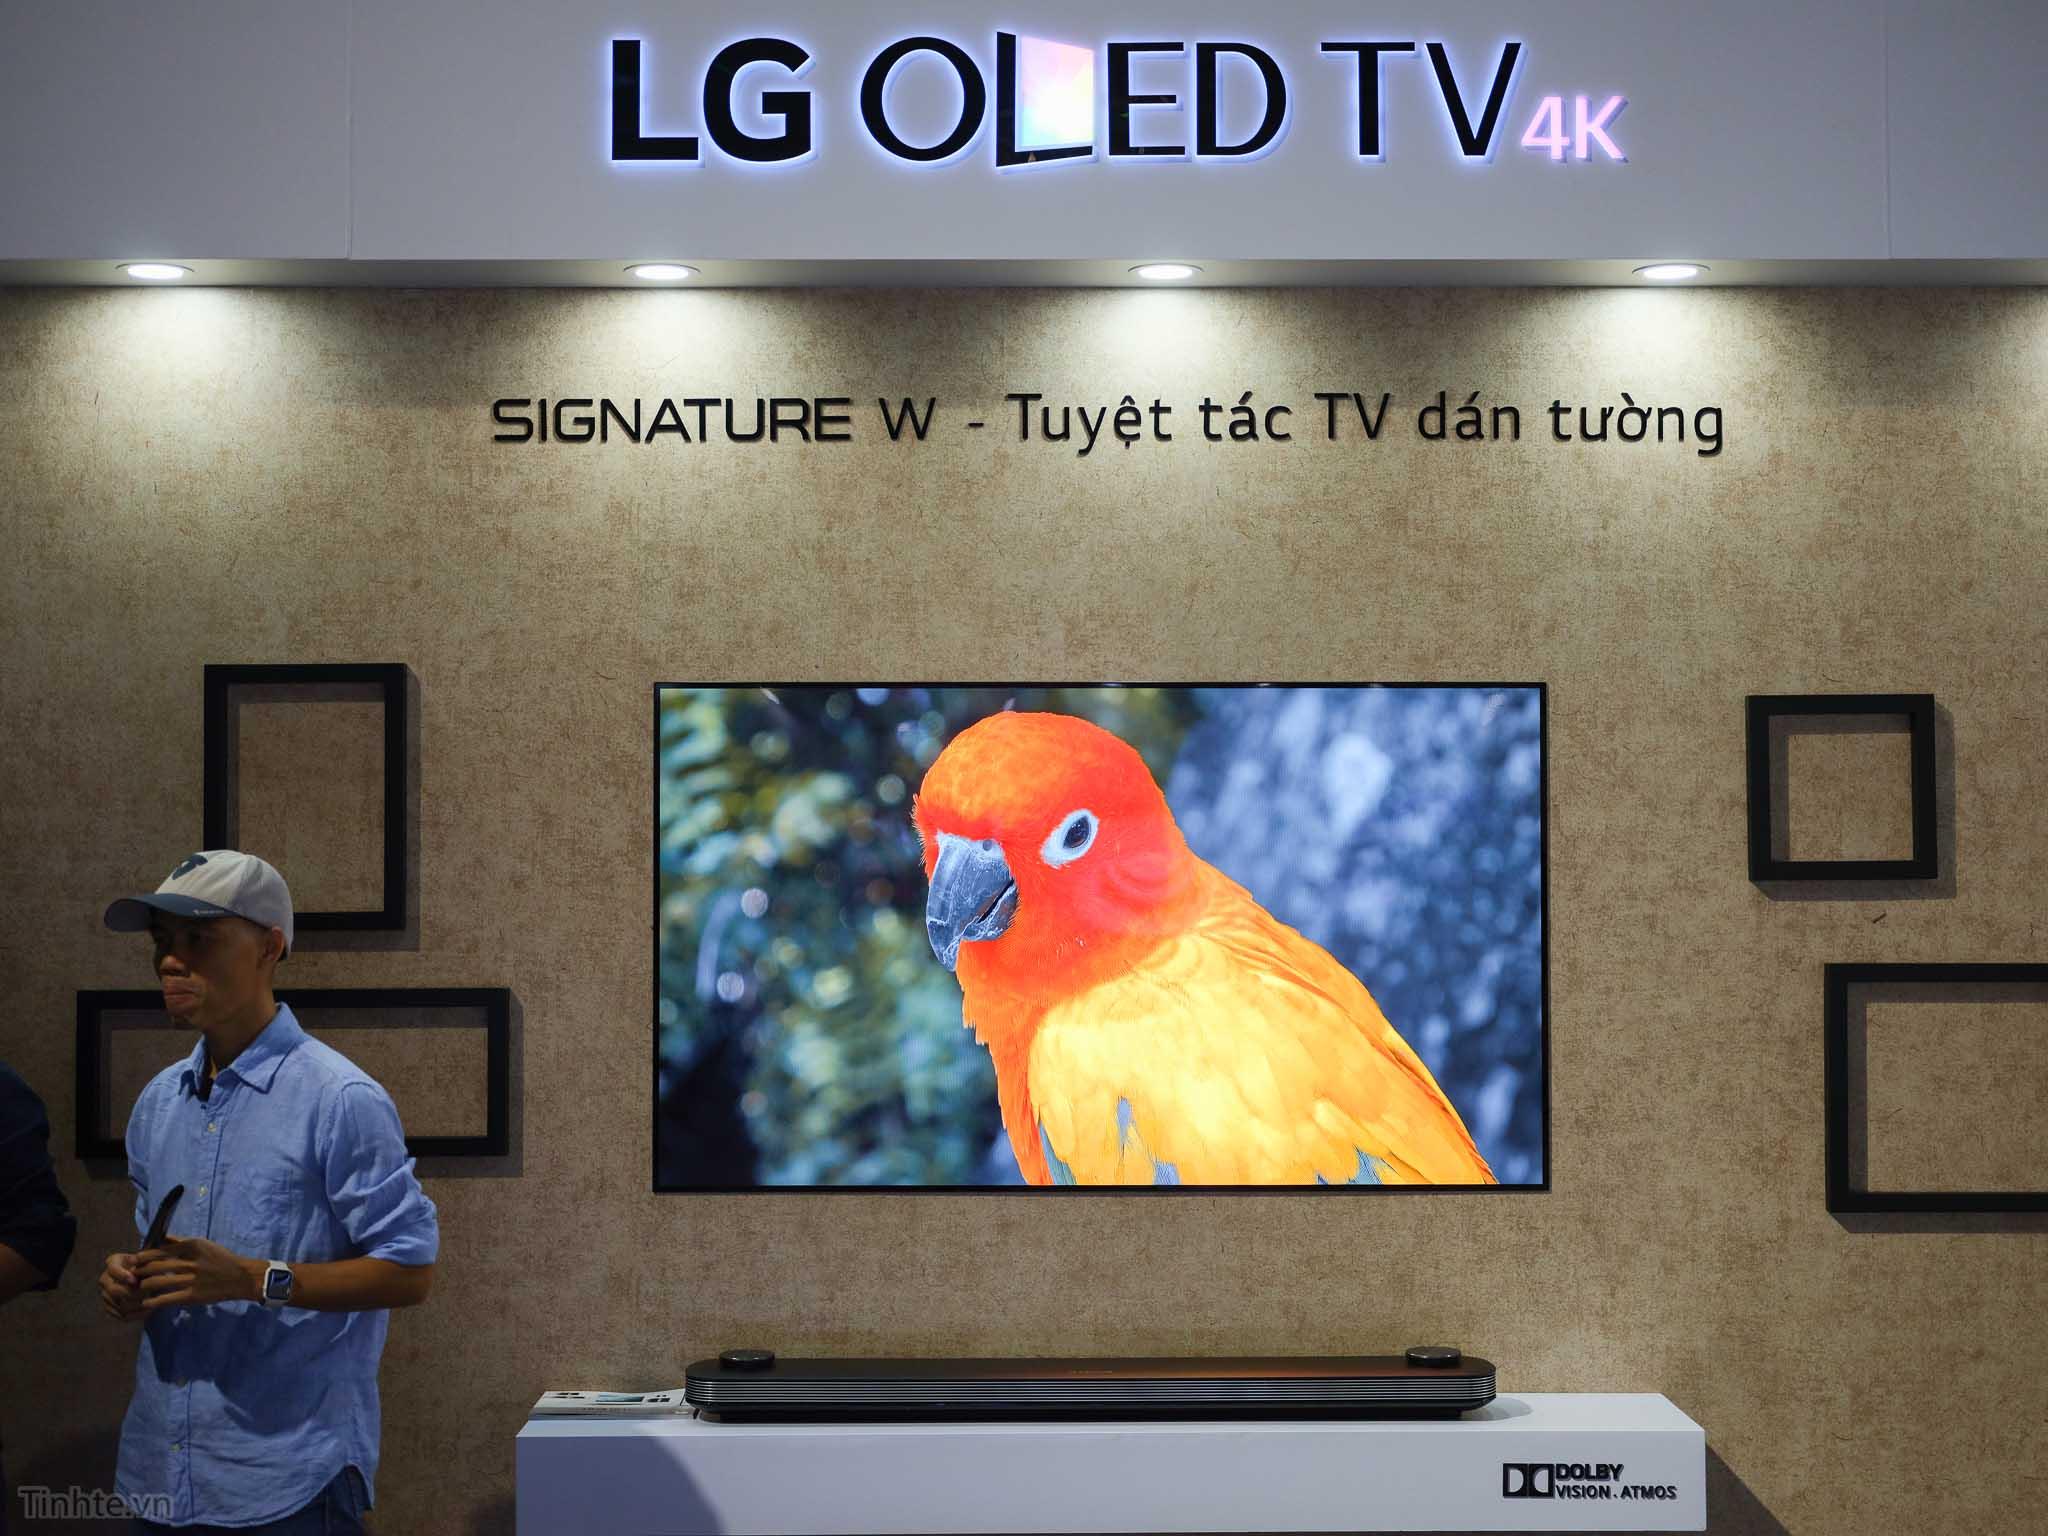 LG_OLED_Treo_tuong_tinhte.vn-7.jpg